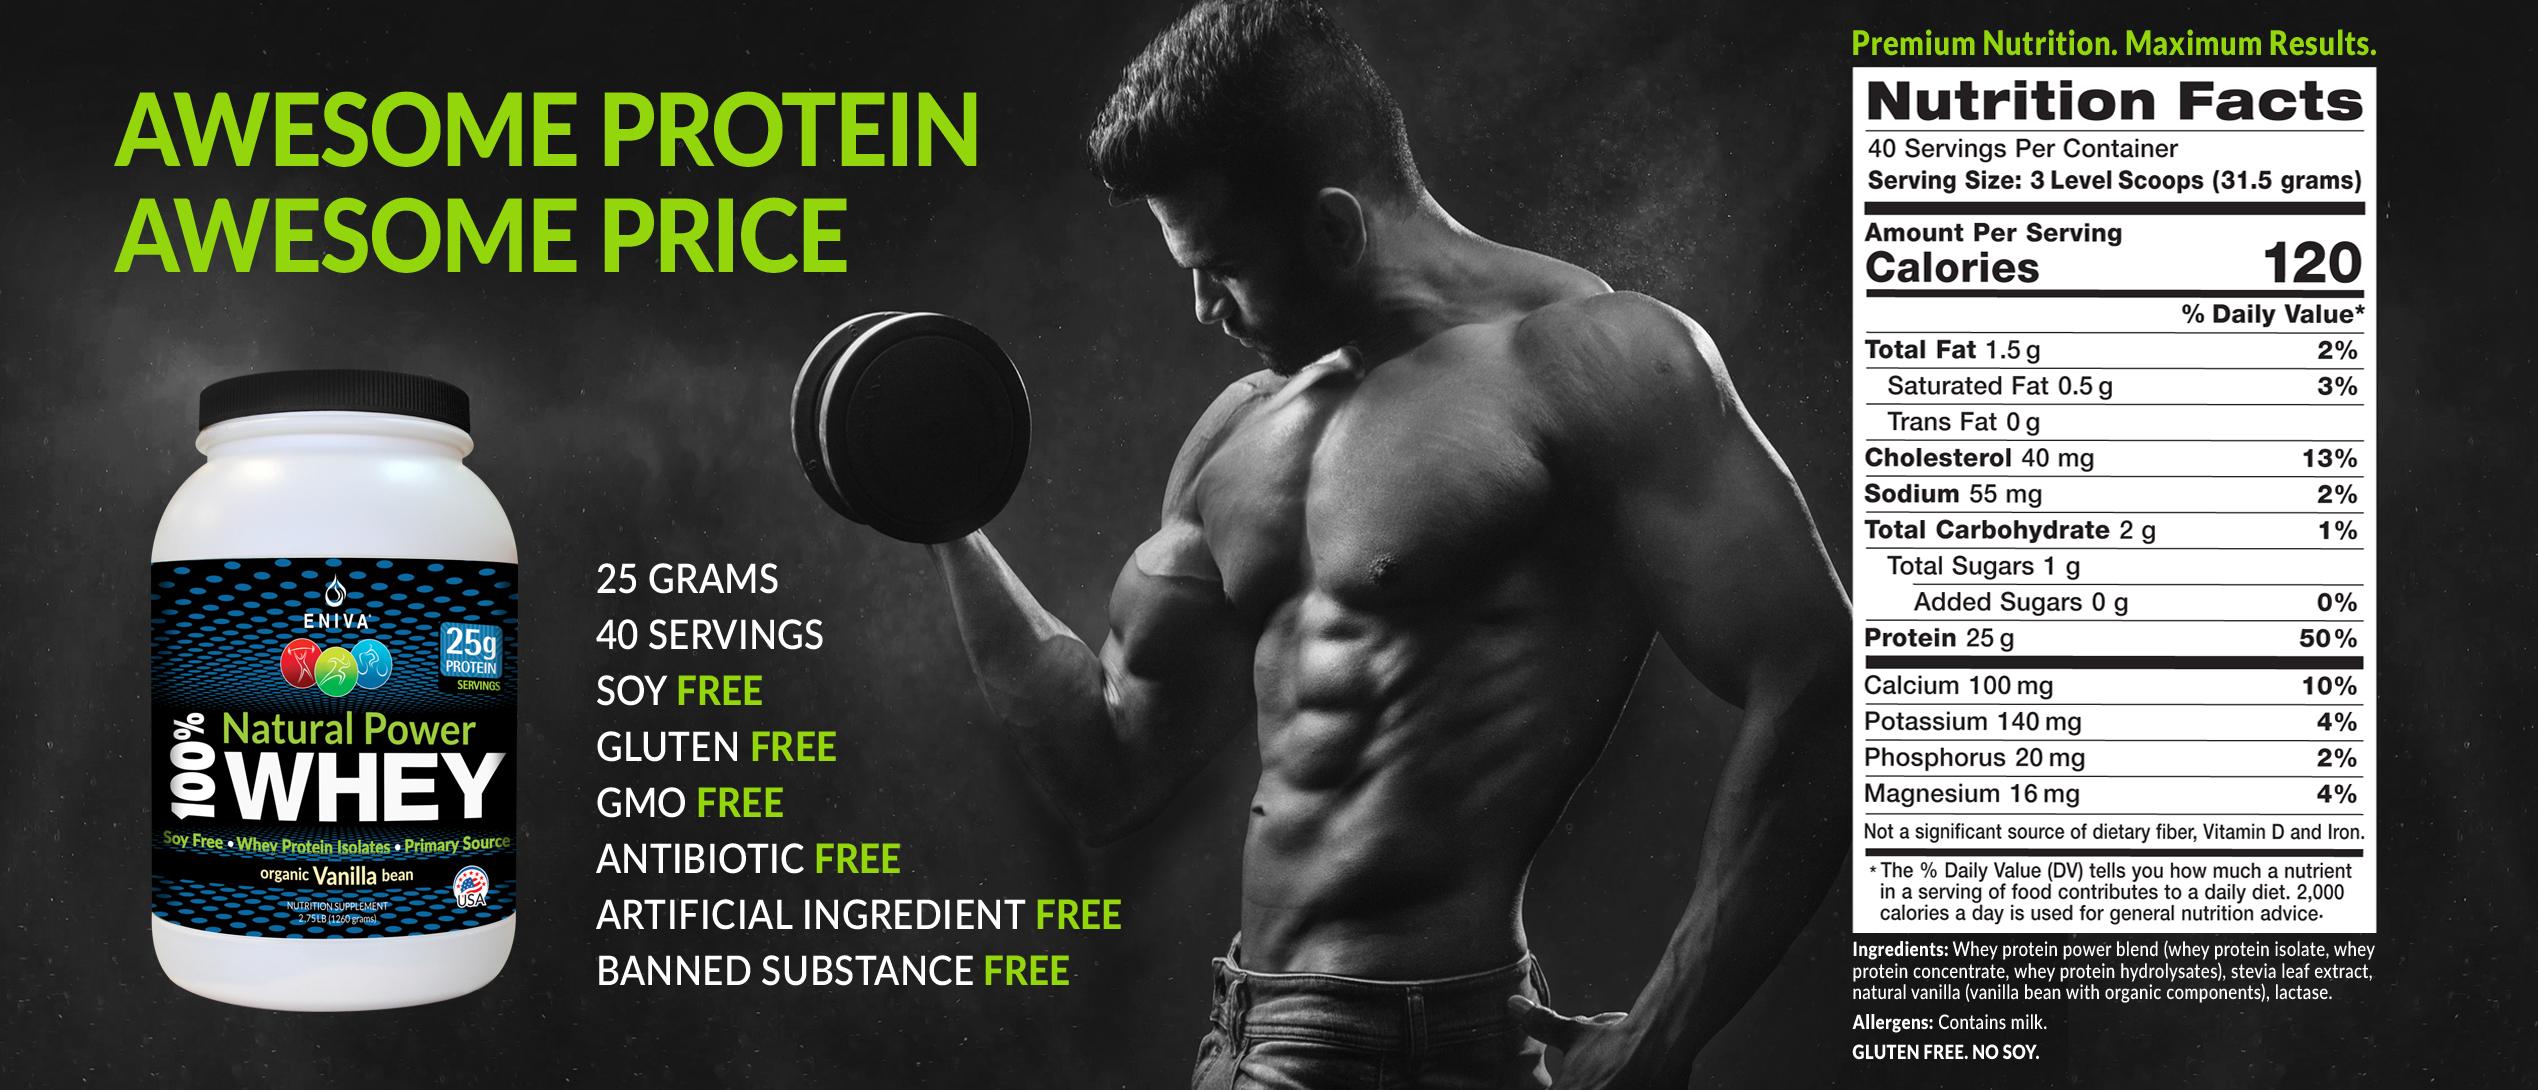 protein-sport-beauty-top-pump-40b.jpg